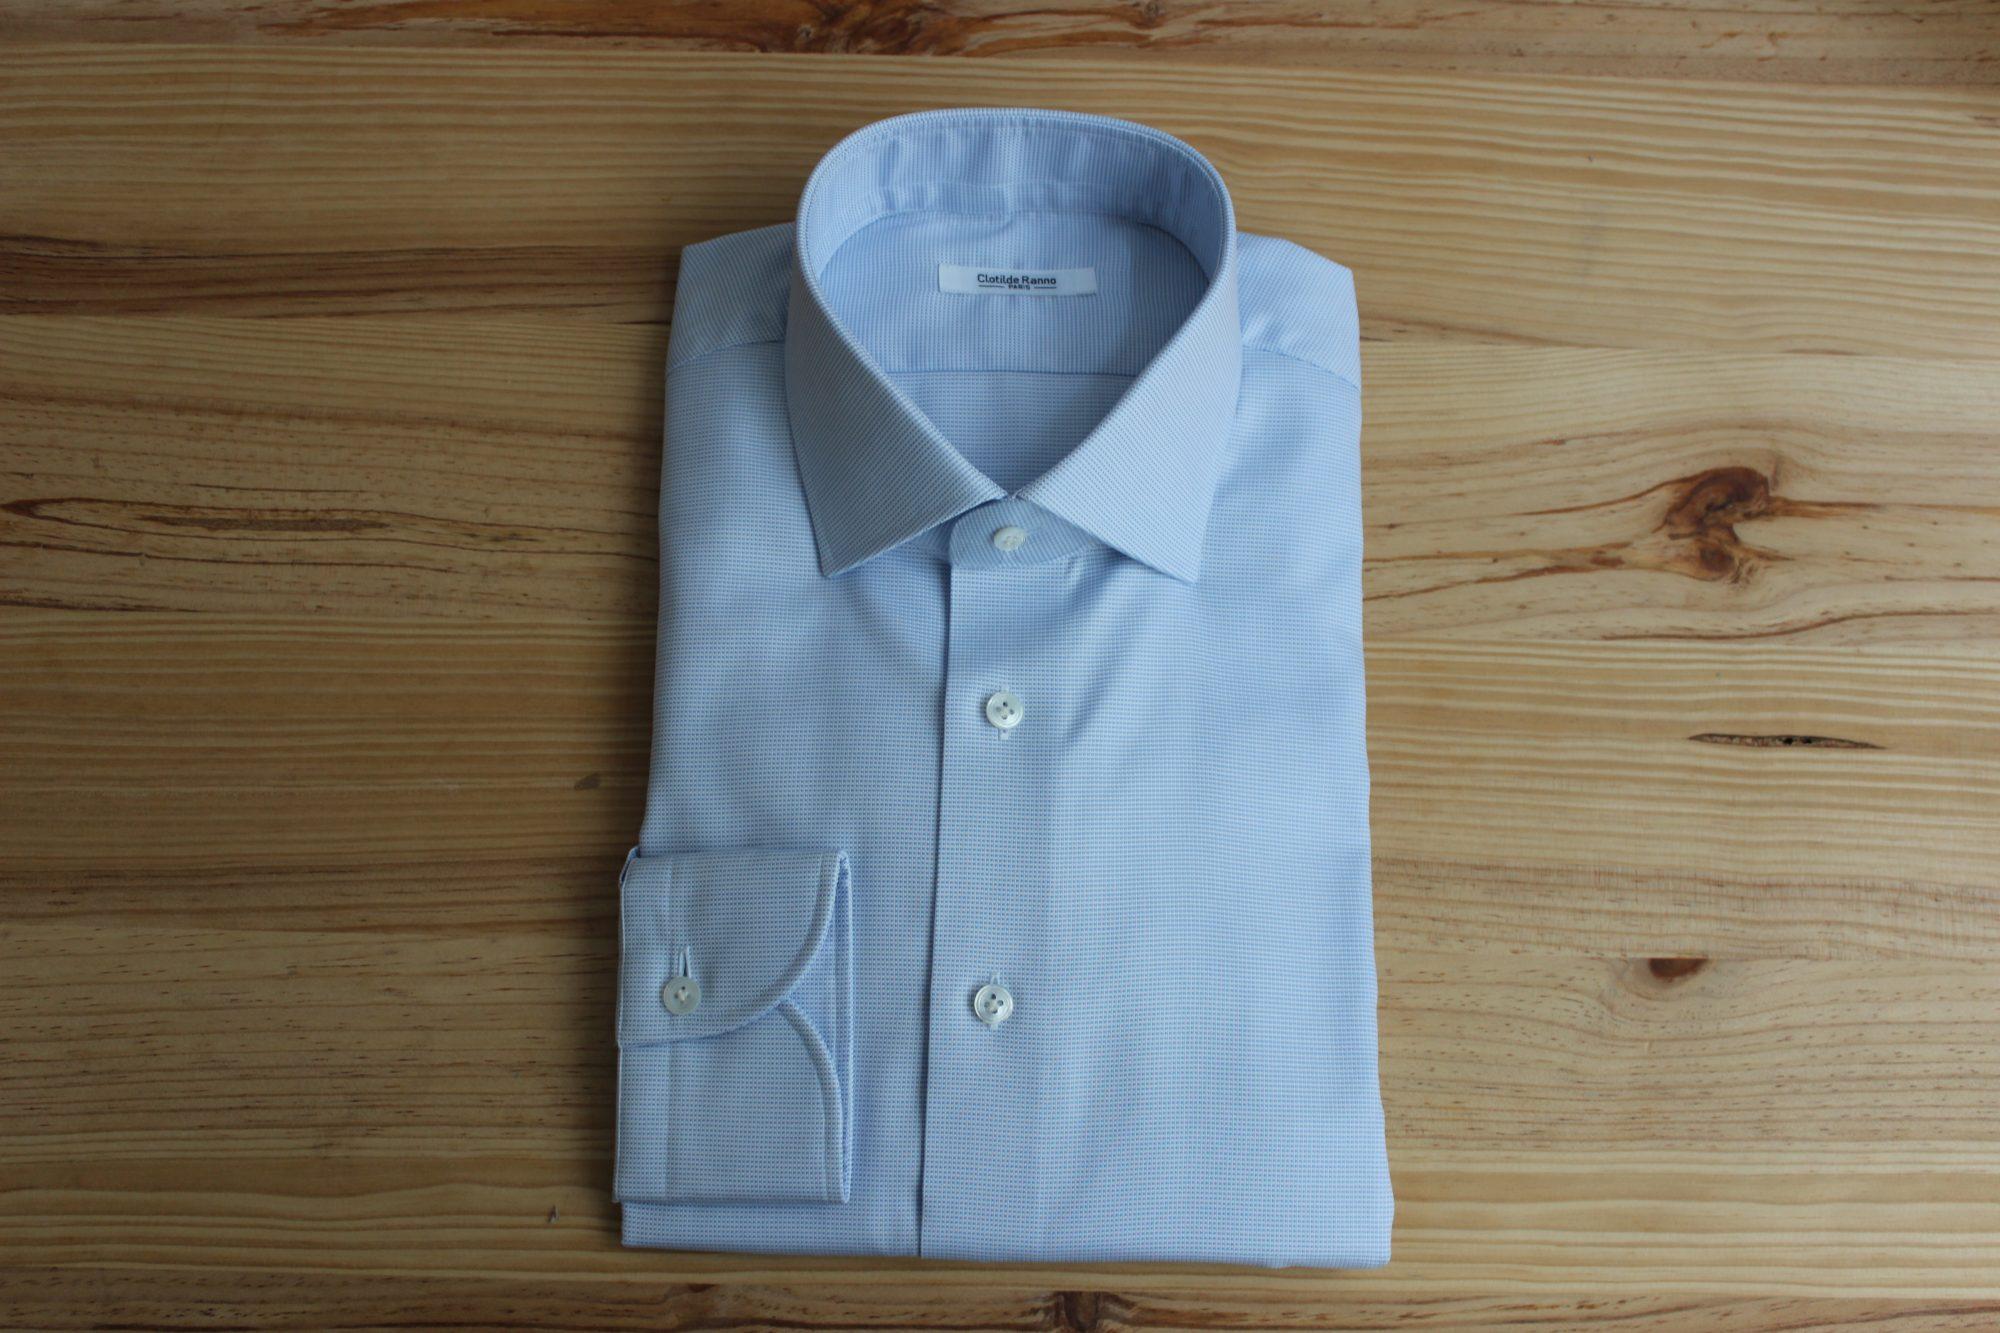 robe chemise bespoke sur mesure , robe chemise sur mesure , robe chemise bespoke